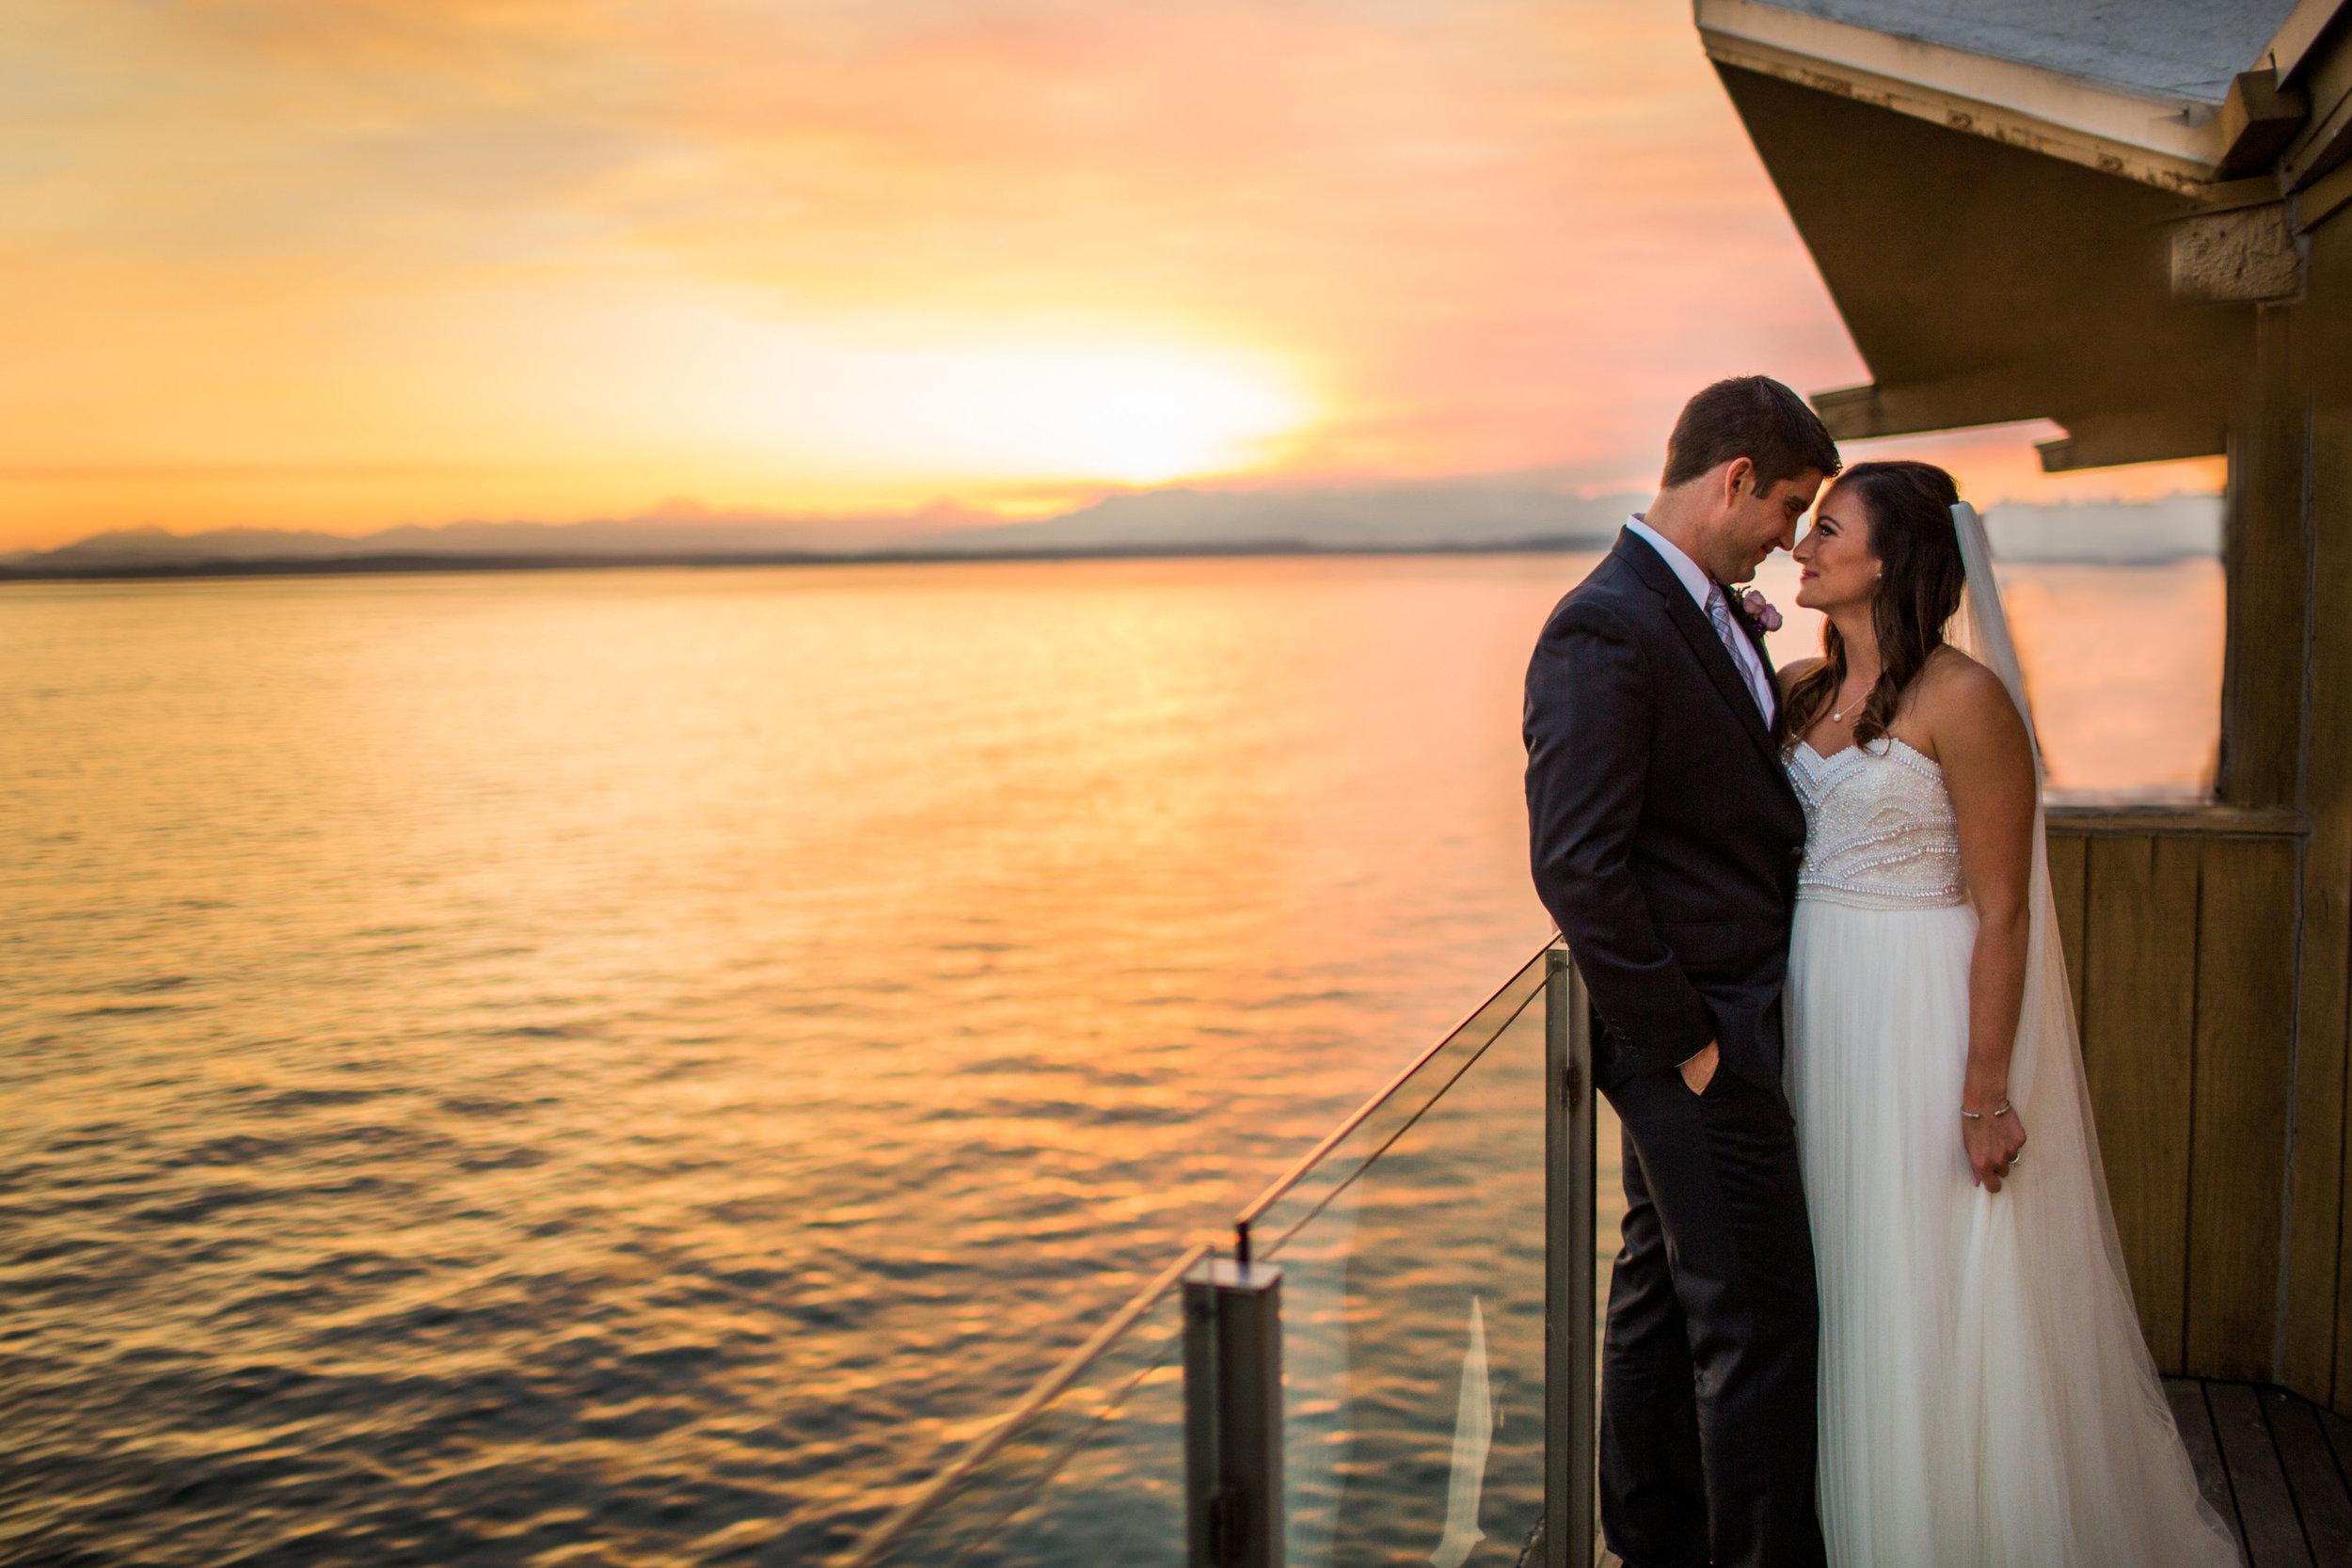 Seattle Wedding Planner, Wedding Wise | Ciccarelli Photography | Edgewater Hotel Wedding | Waterfront wedding | Sunset wedding photos